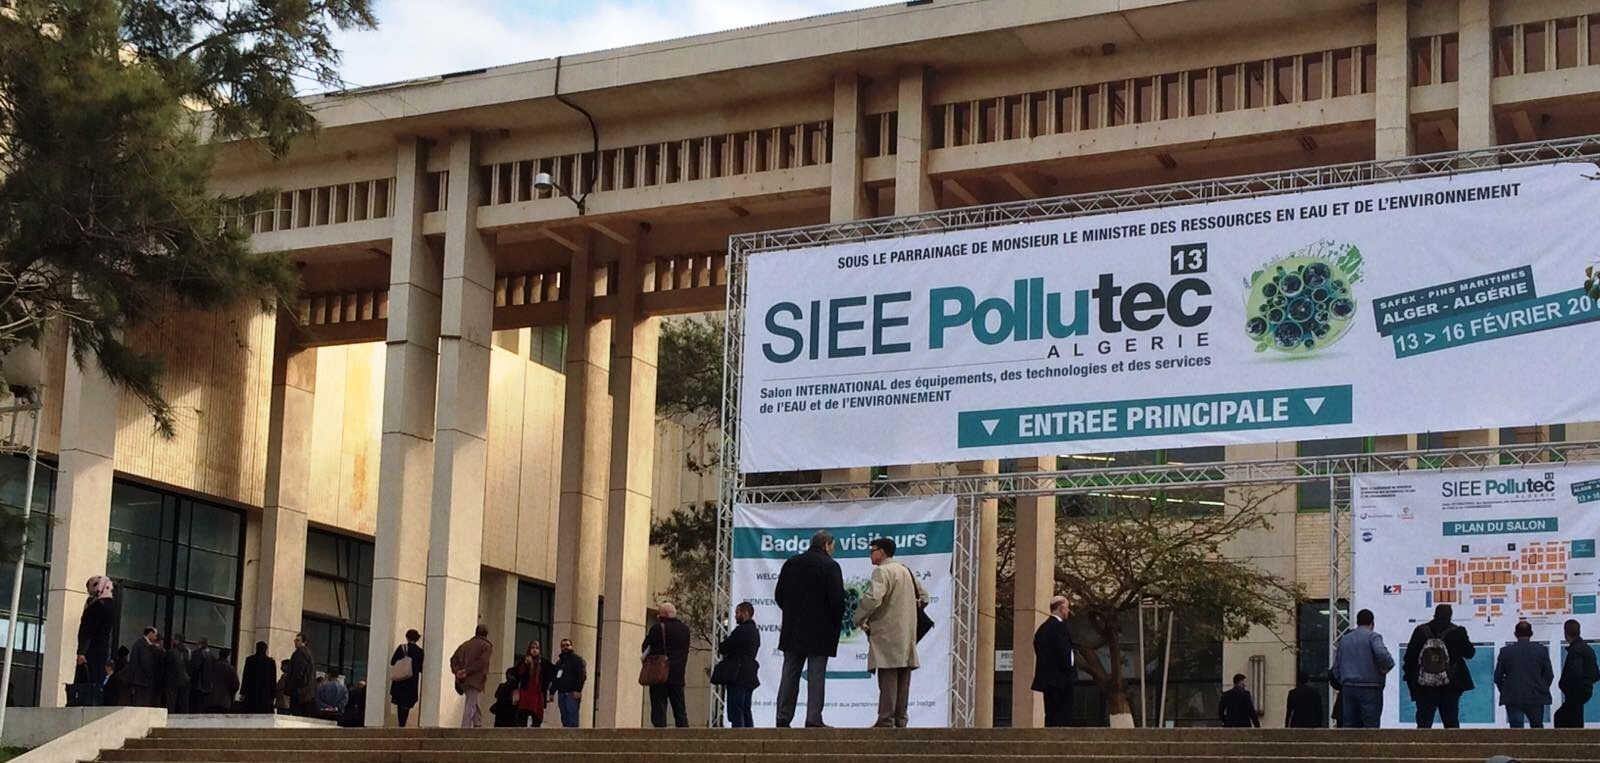 SIEE Pollutec ALGERIE 2019